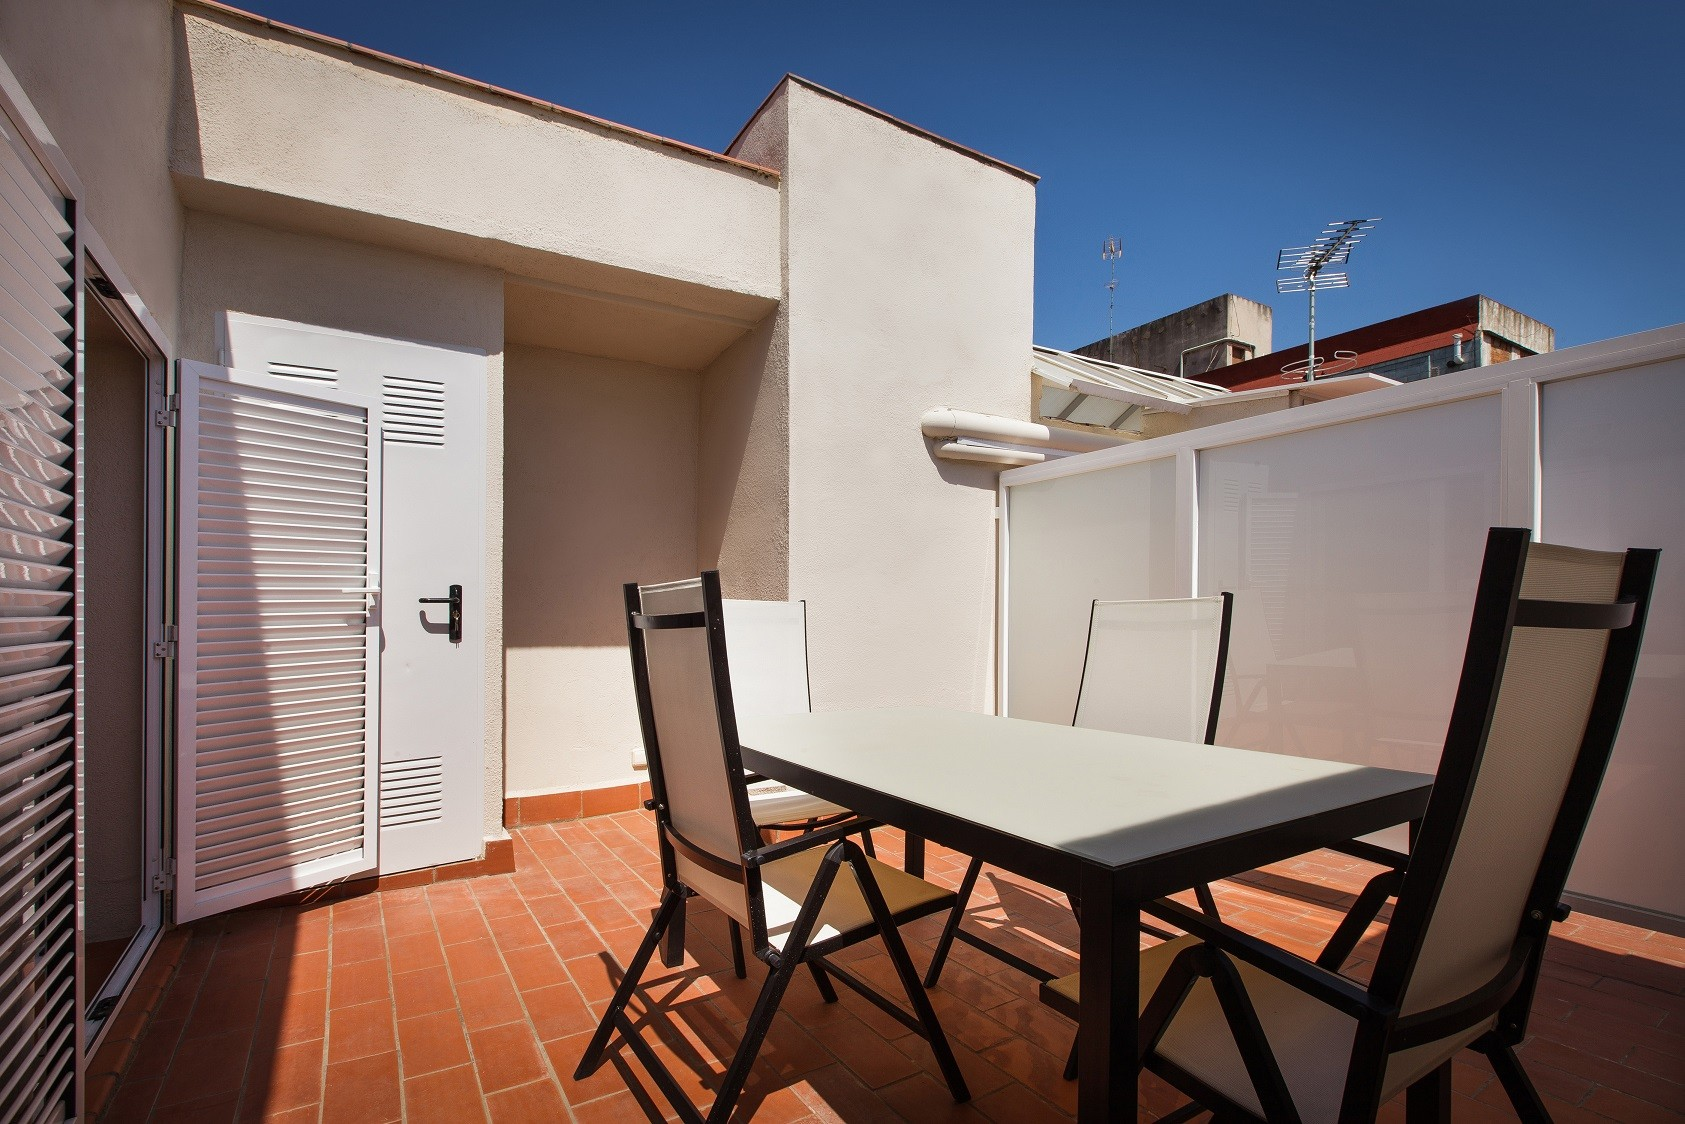 Dailyflats Sagrada Familia 1-bedroom (1-4 adults) Attic apartment in Barcelona 4